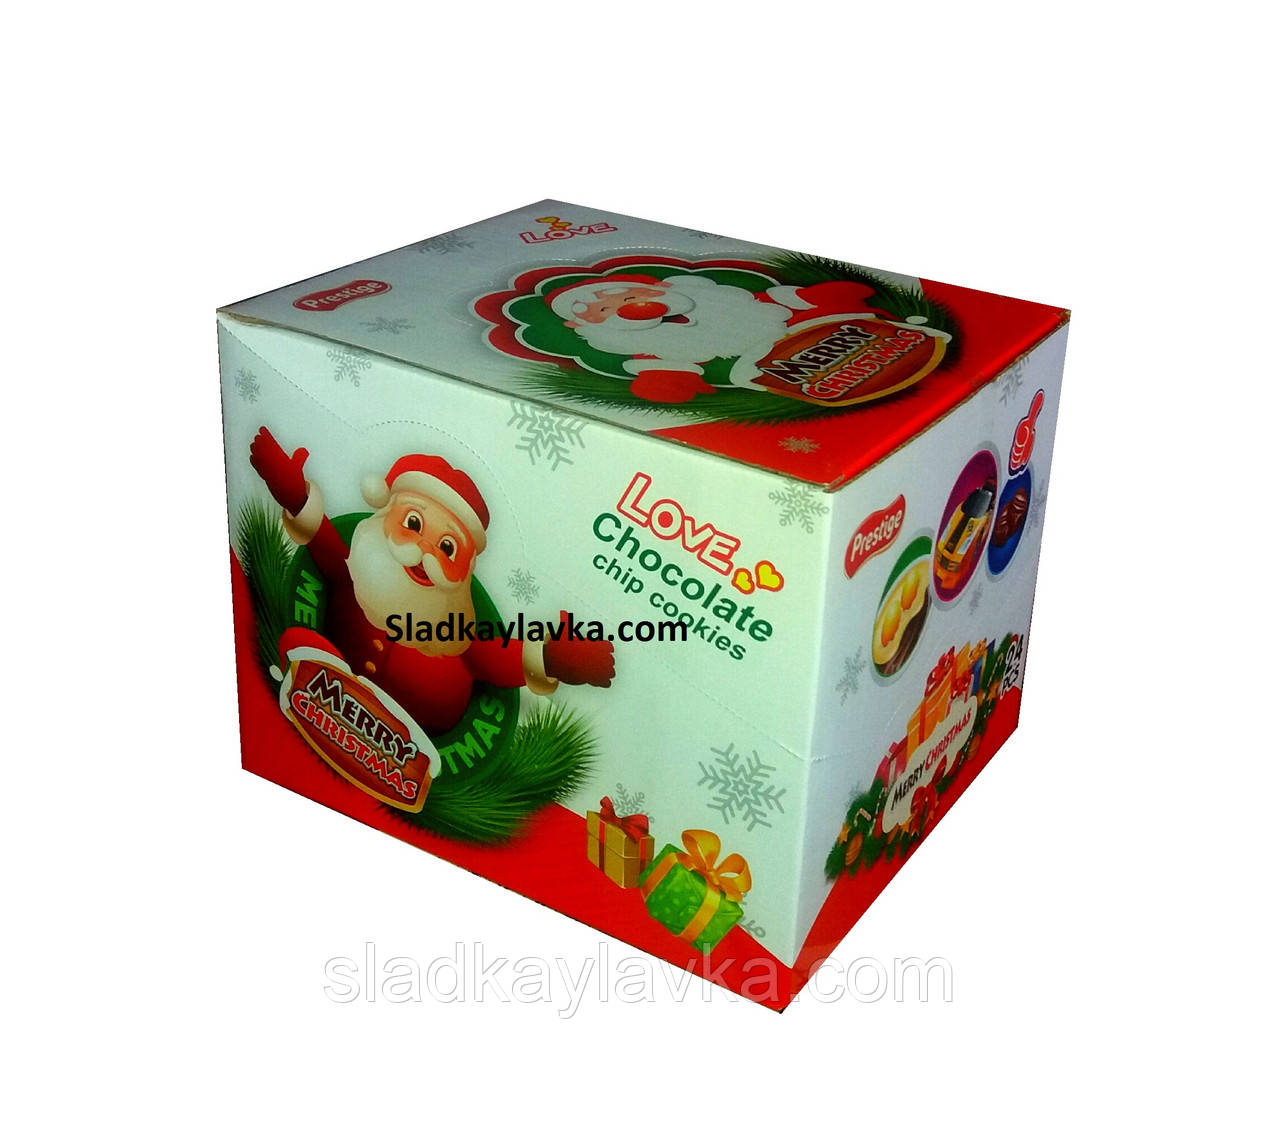 Яйцо шоколадное пластиковое Toy Новогоднее 24 шт, 15 гр (Prestige)